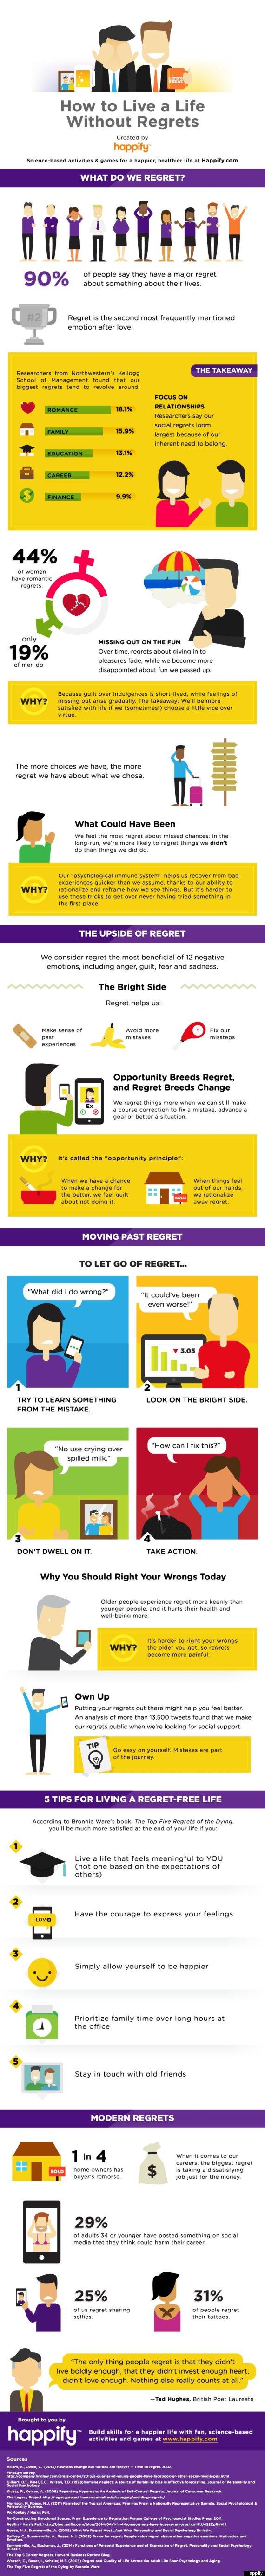 regrets infographic